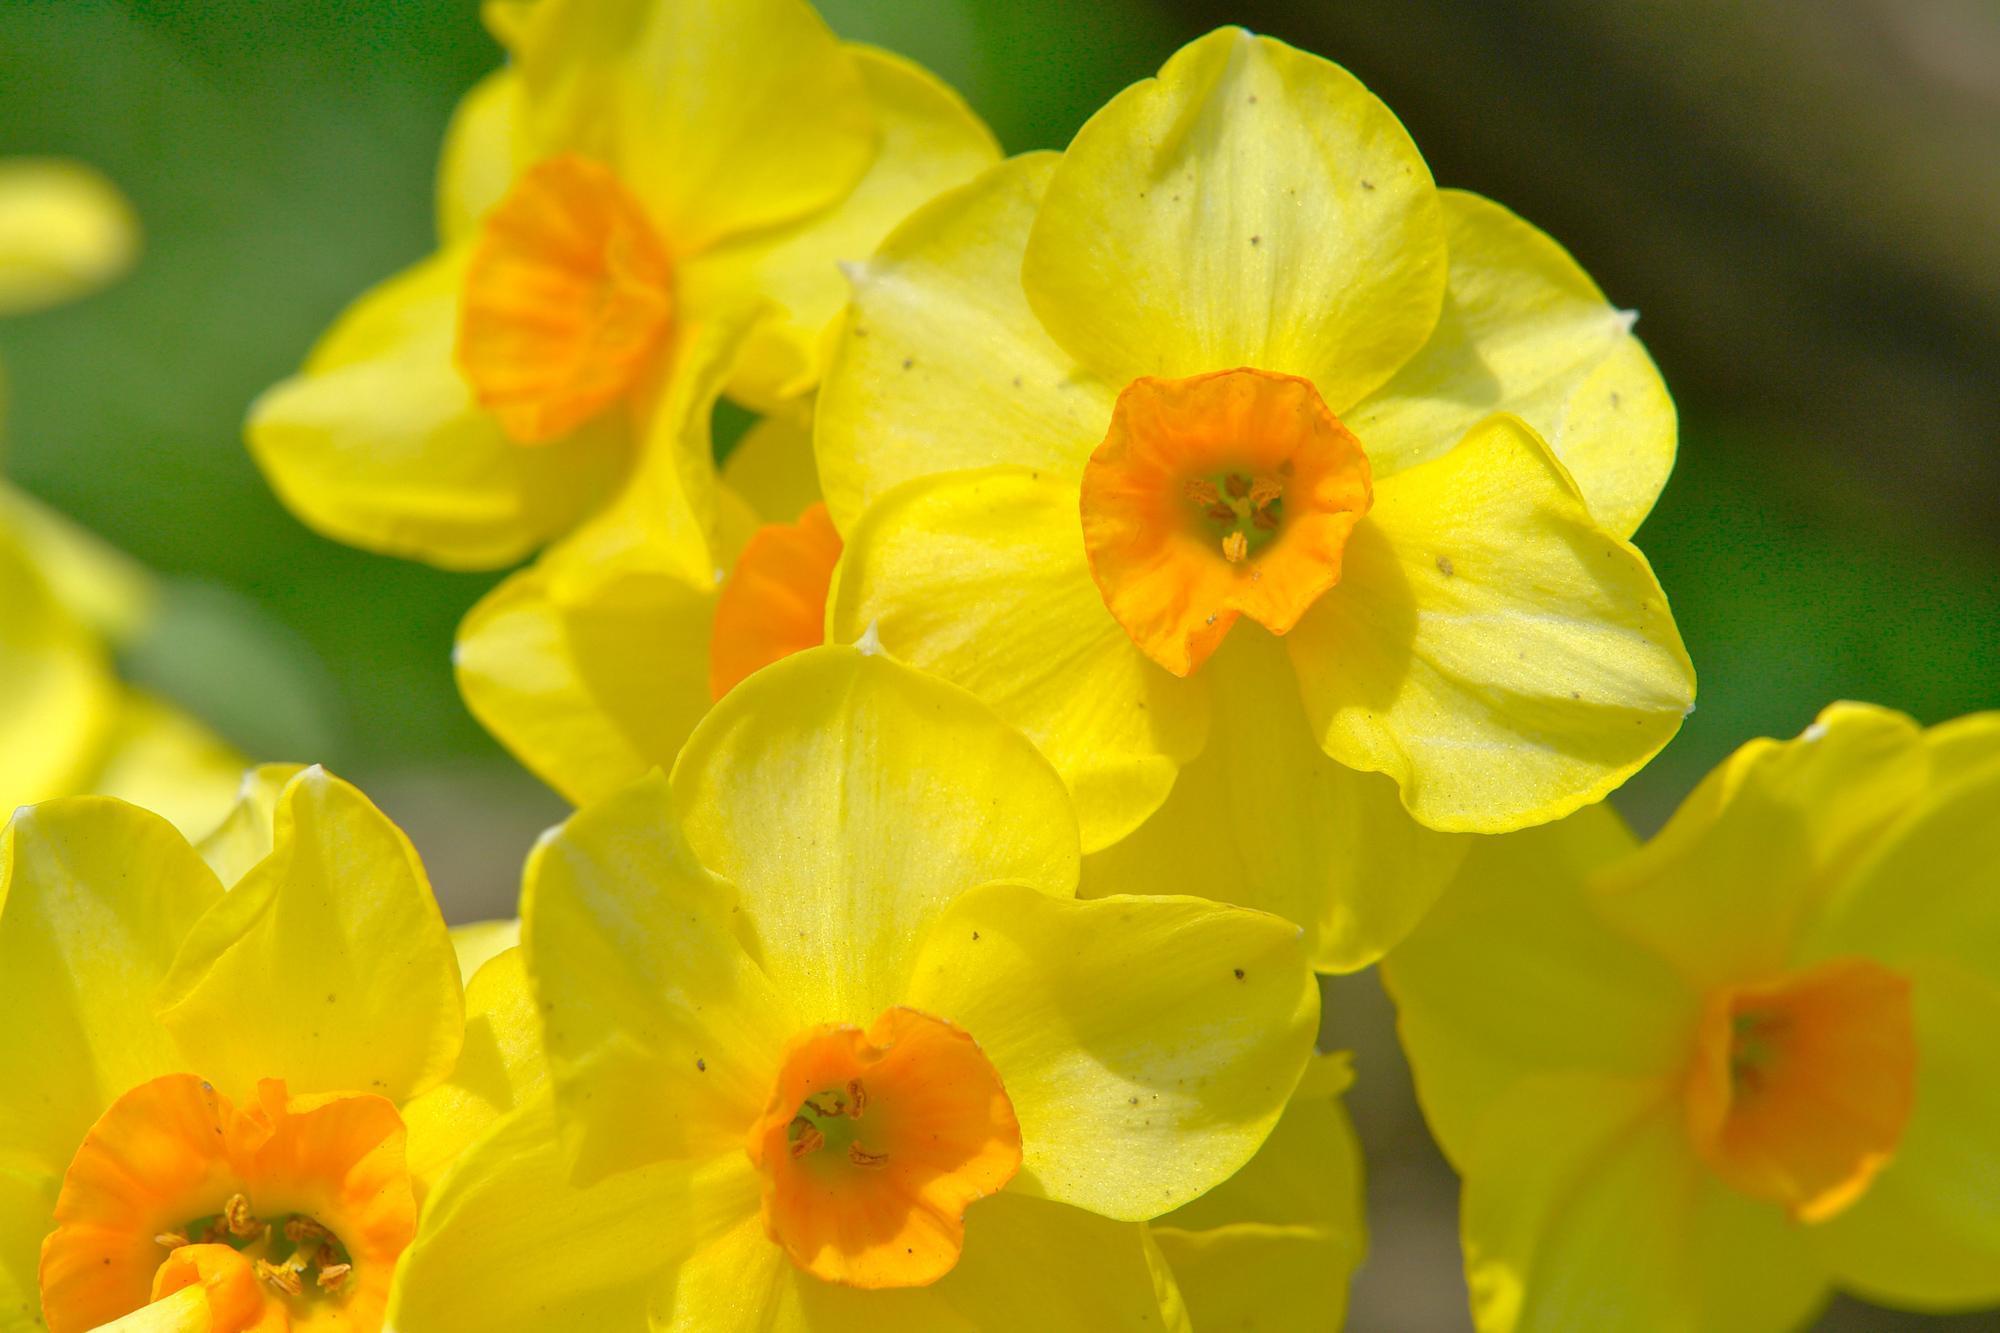 Free Desktop Backgrounds Spring Flowers - HD Nature Wallpaper